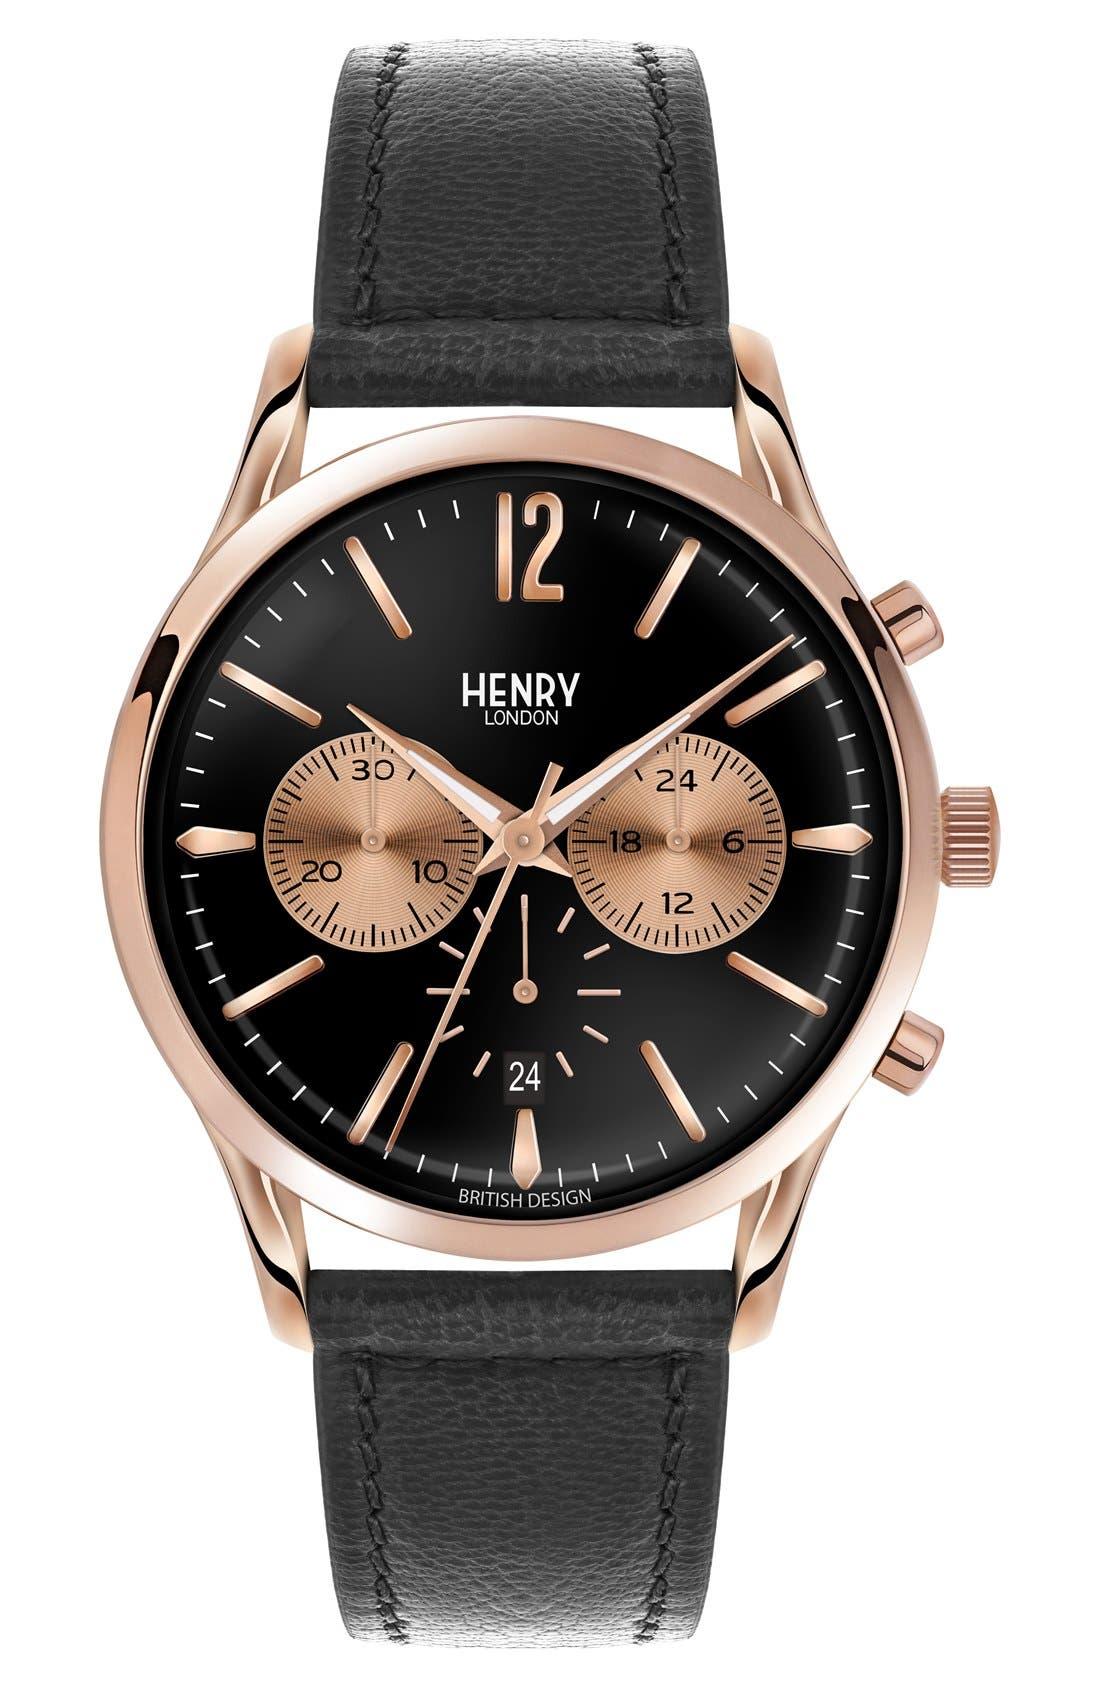 Main Image - Henry London 'Richmond' Chronograph Leather Strap Watch, 41mm